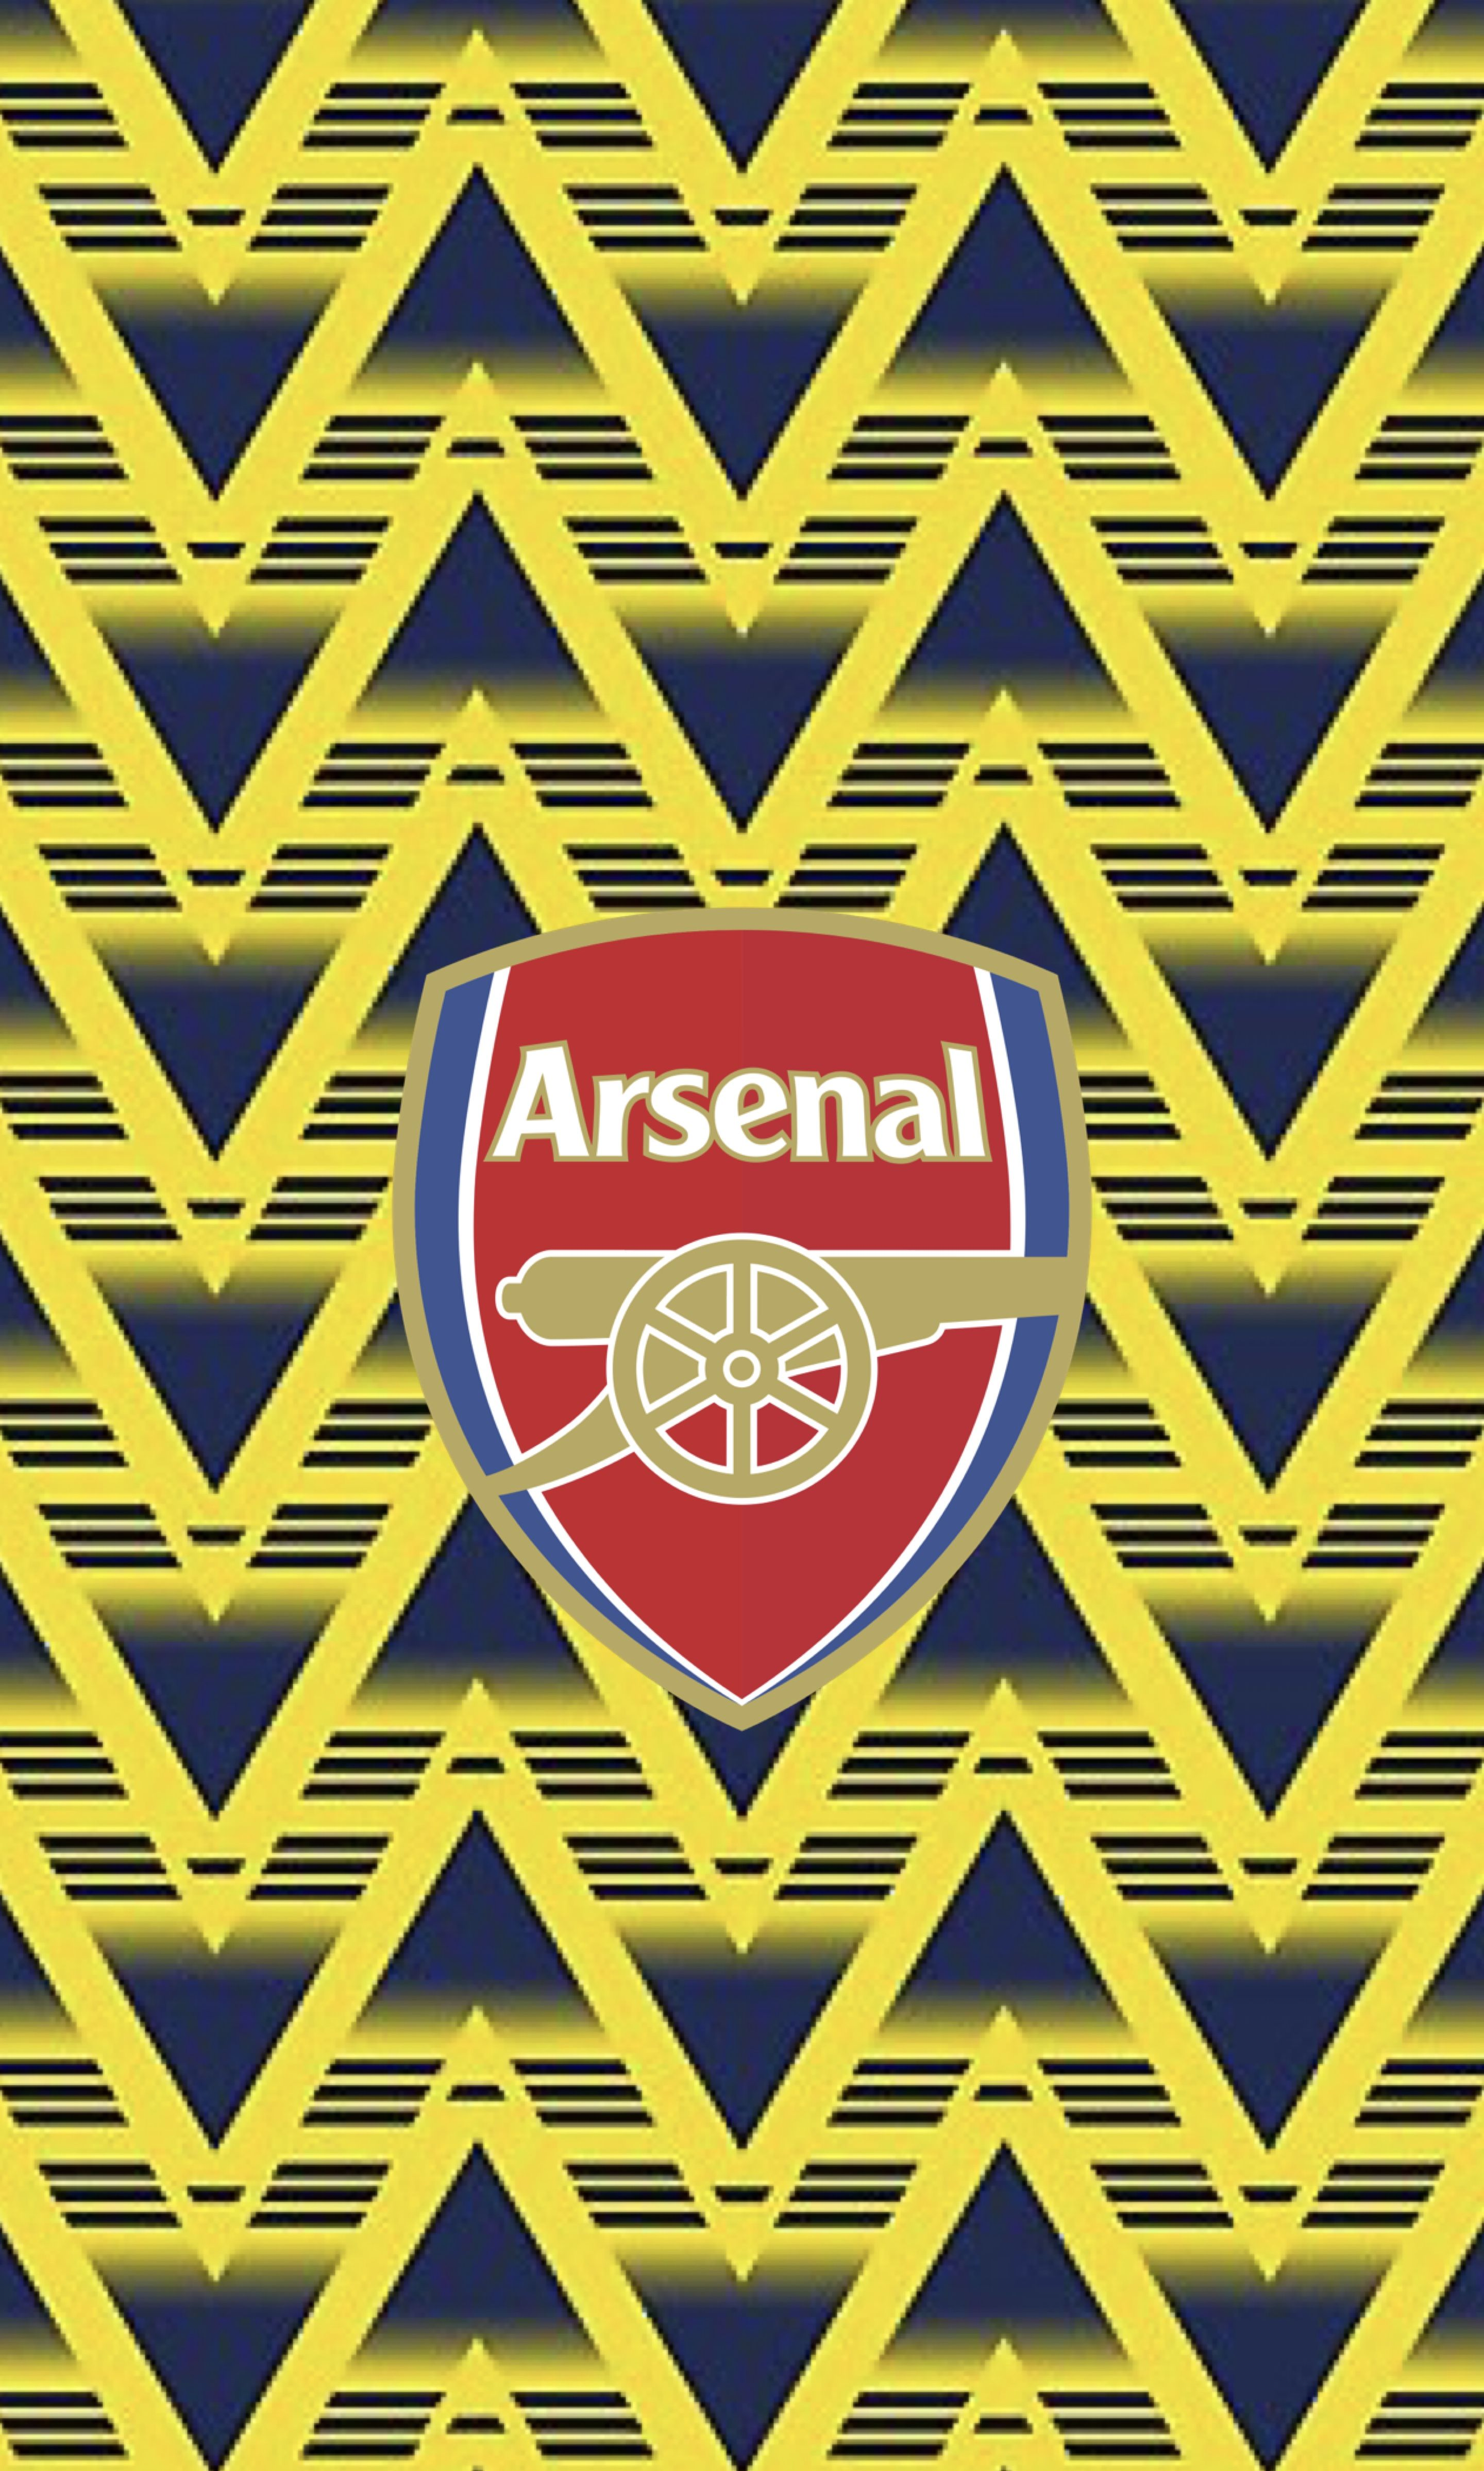 Bruised Banana Retro Arsenal Wallpaper Arsenal Wallpapers Football Lovers Arsenal